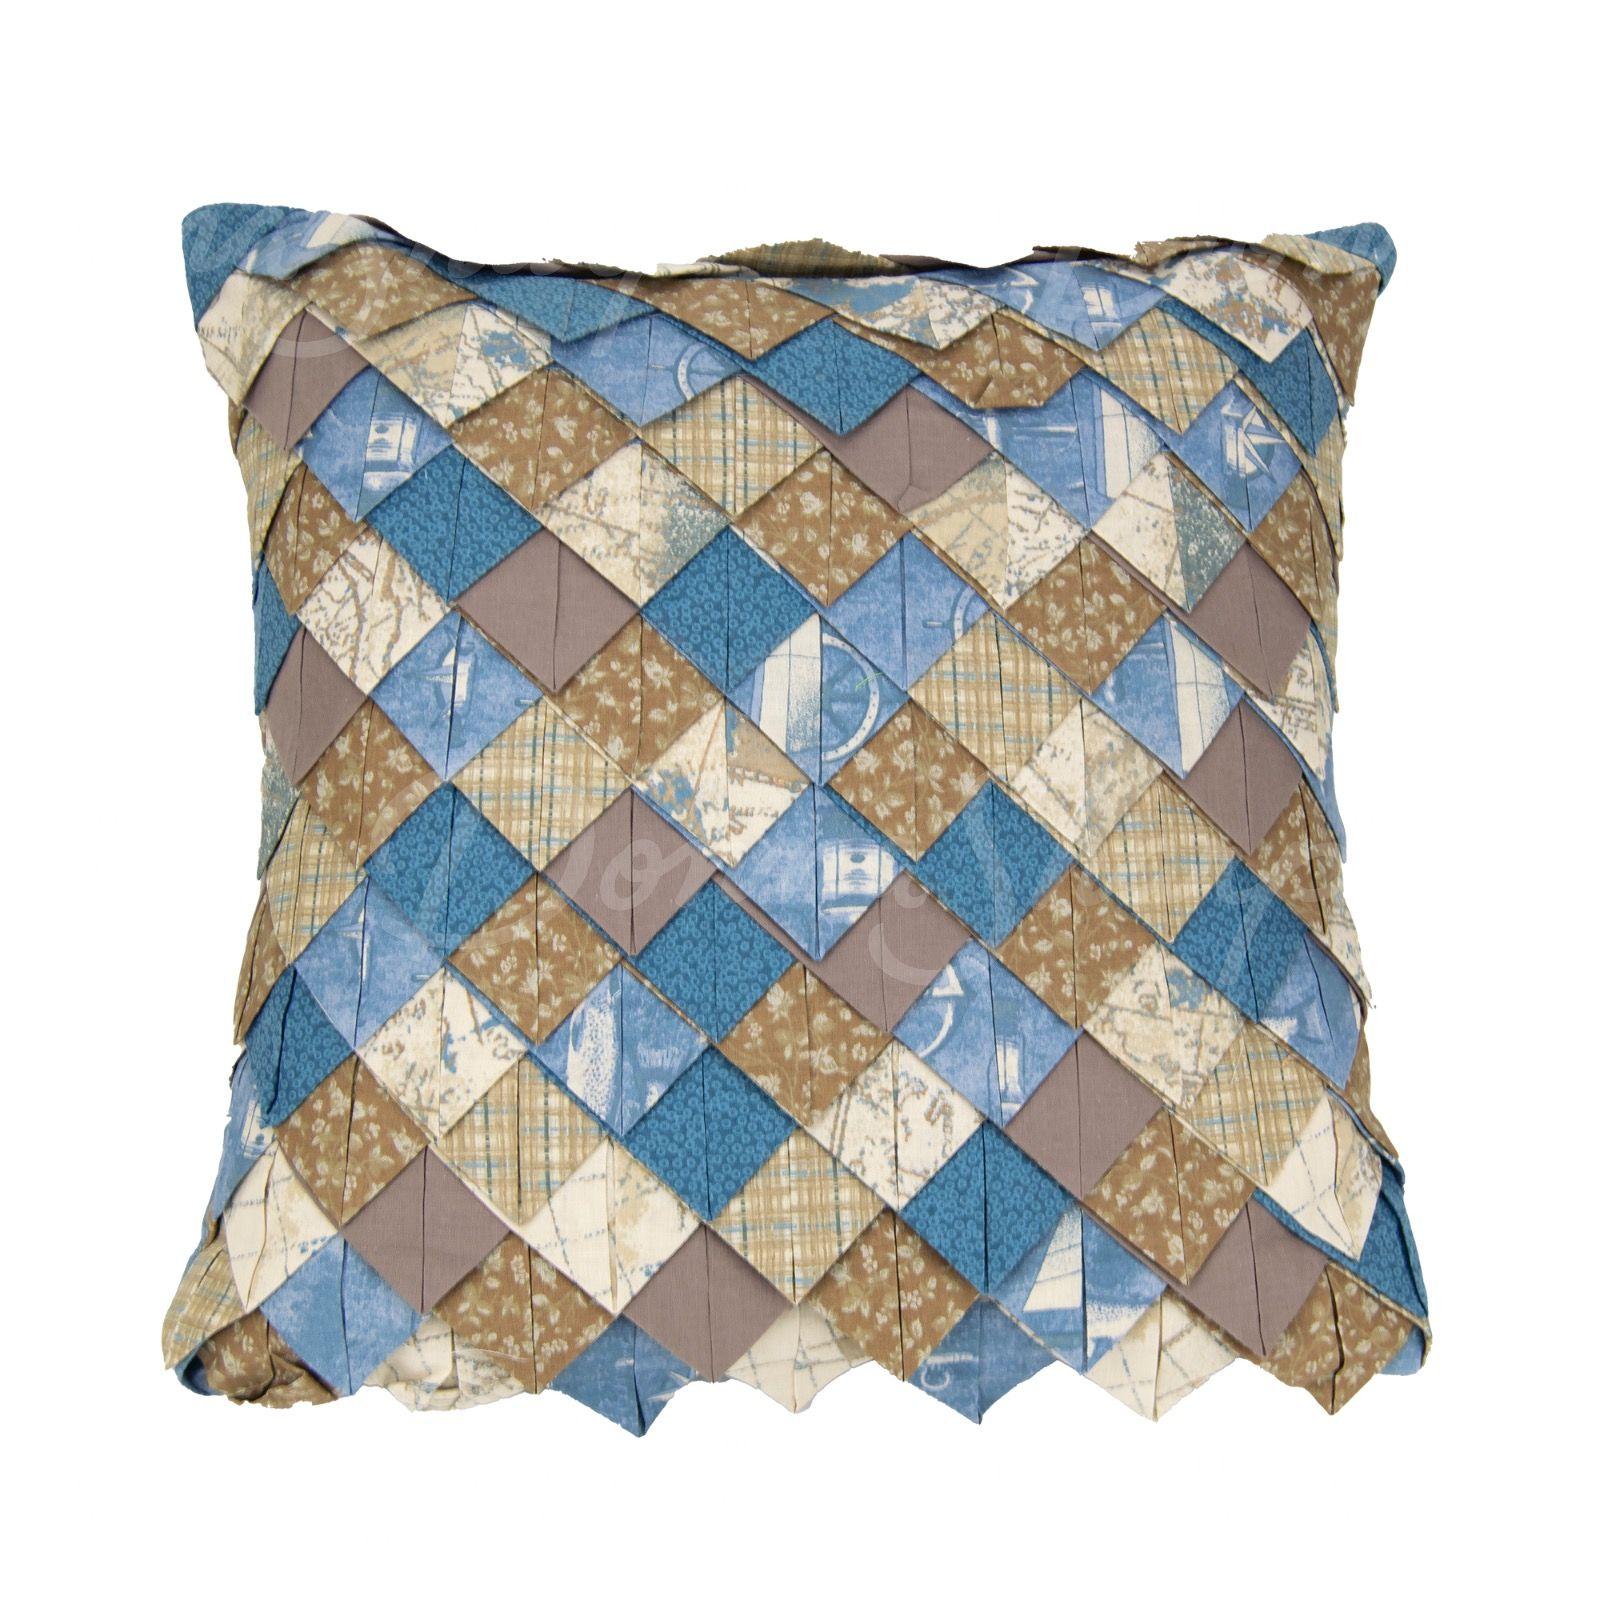 Roof Tile Nautical Square Decorative Pillow